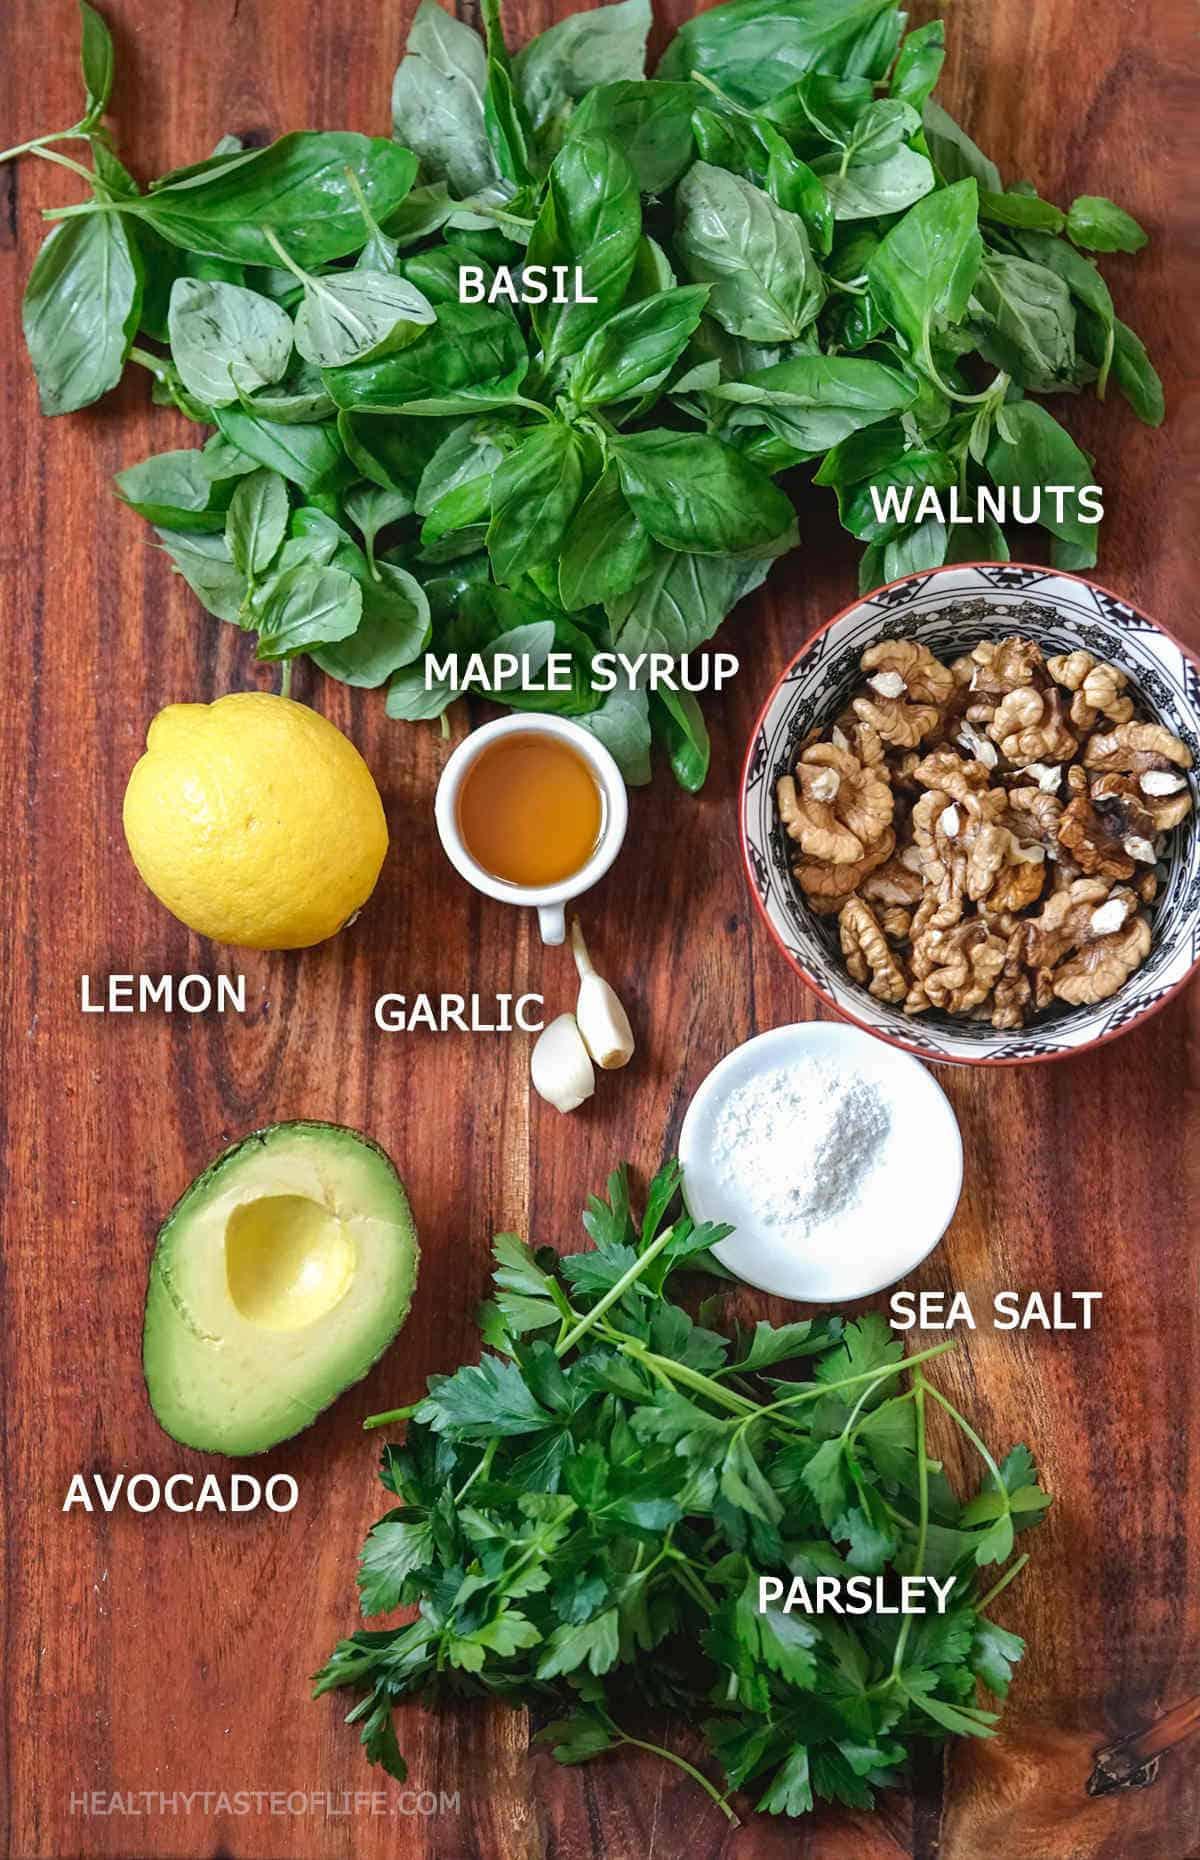 Ingredients for making creamy basil pesto vegan gluten free - avocado, walnuts, parsley, lemon, garlic, maple syrup and sea salt.